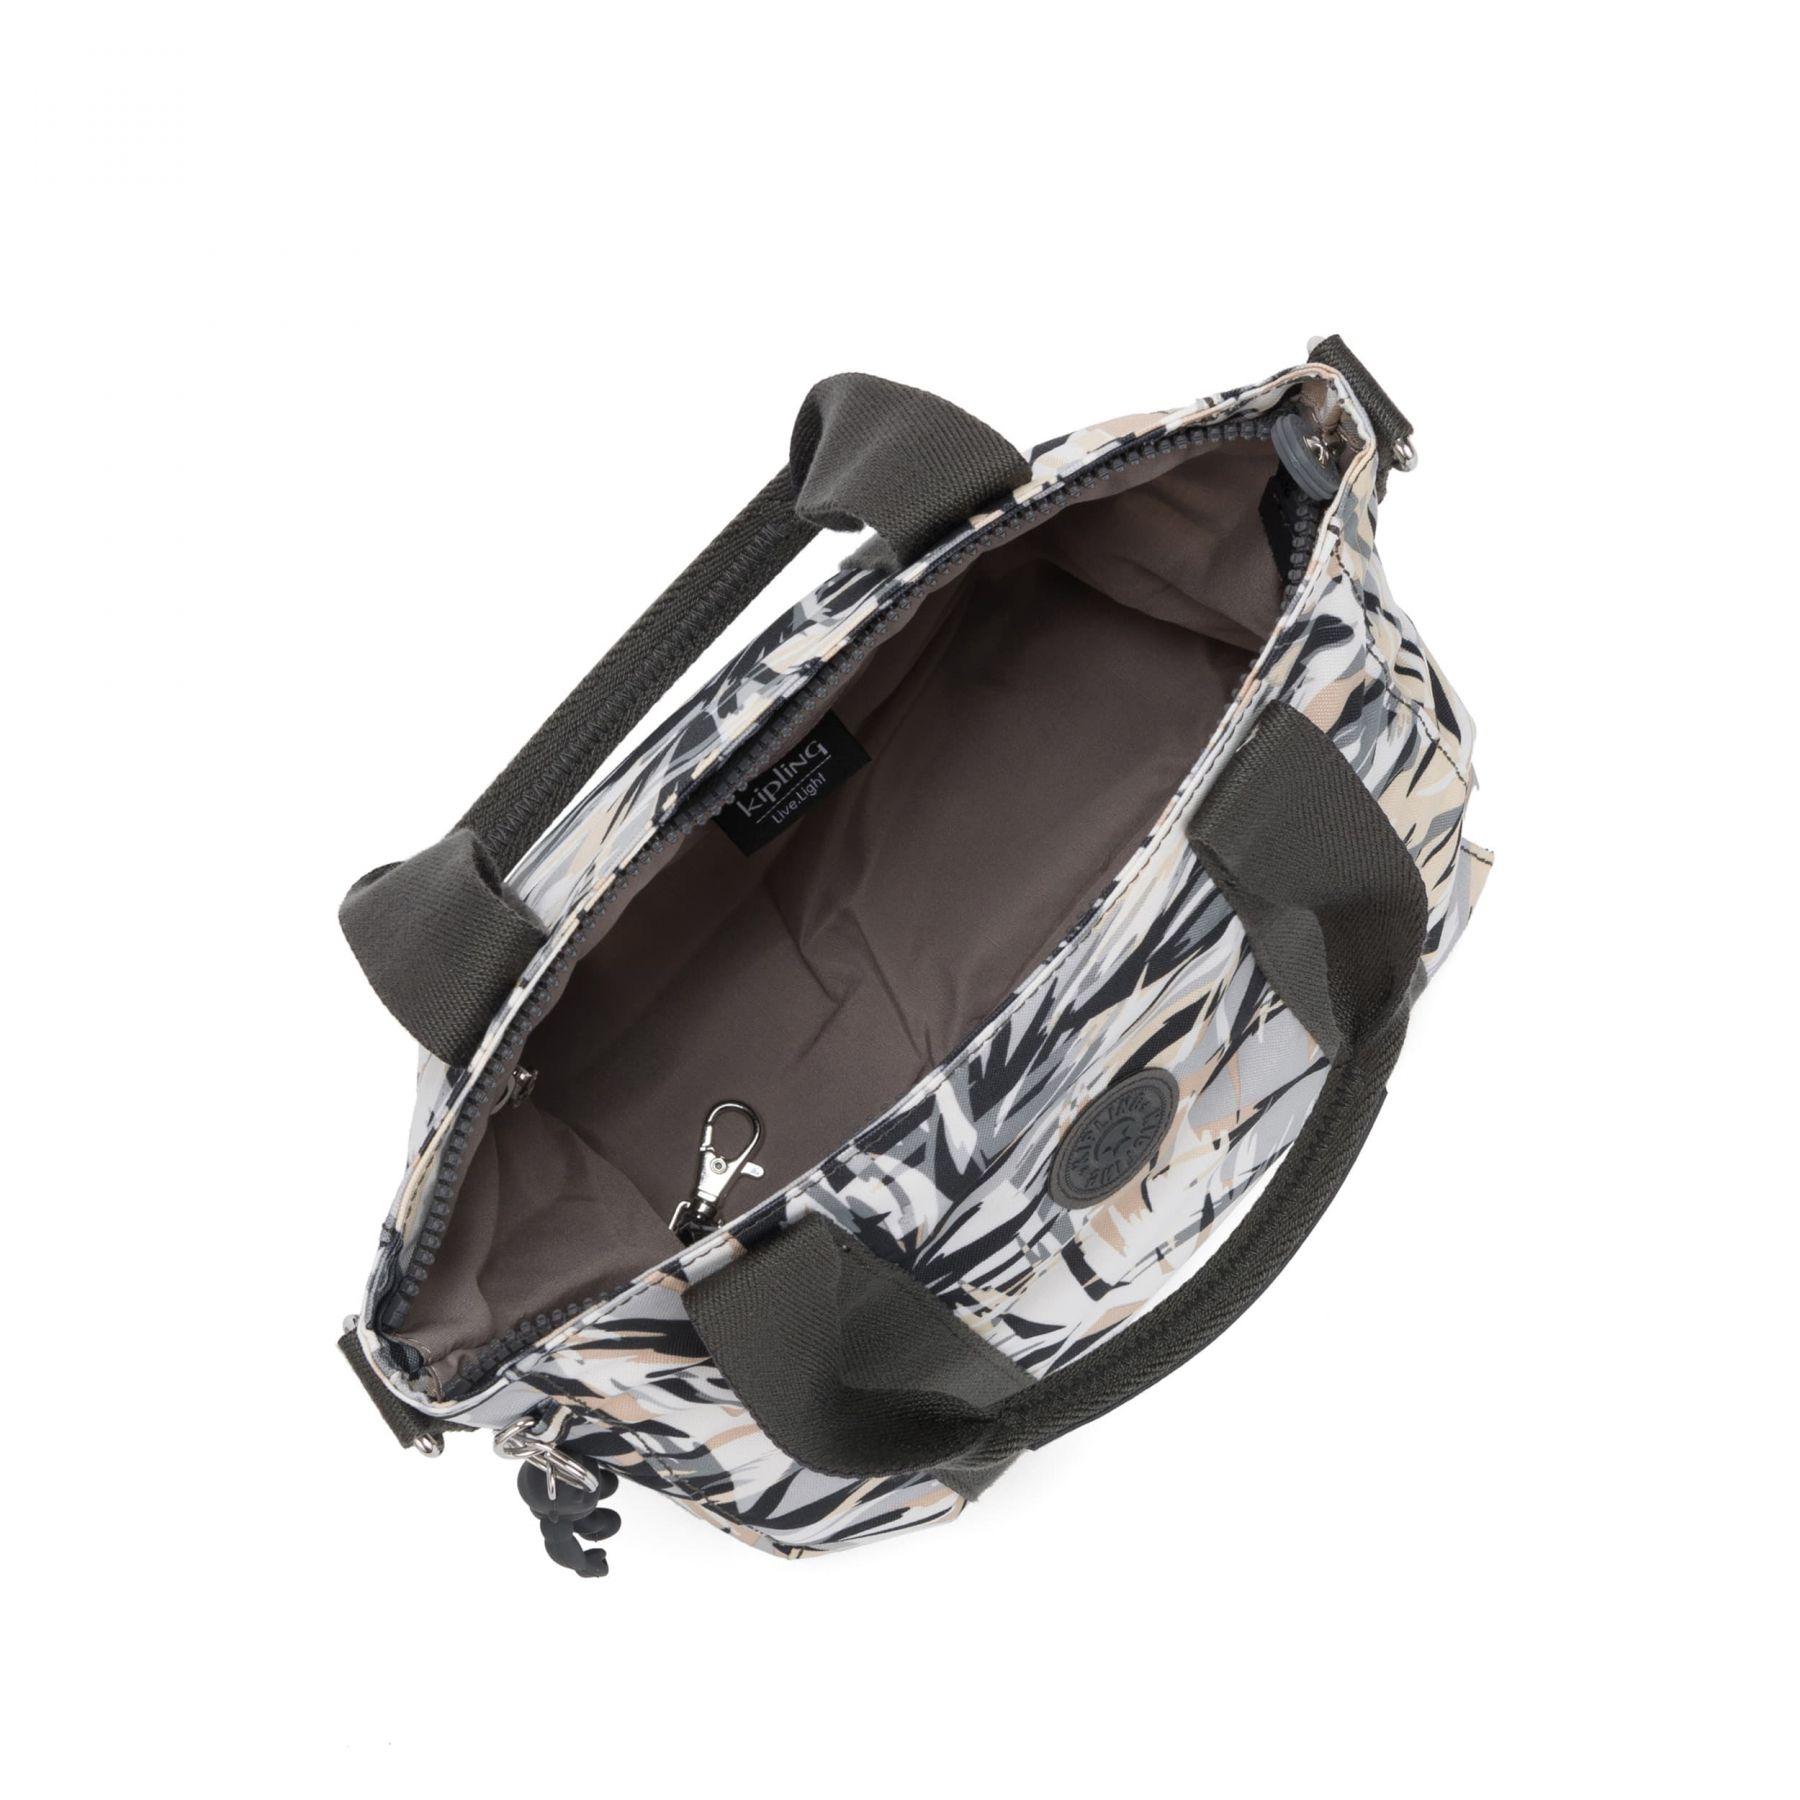 ASSENI MINI BAGS by Kipling